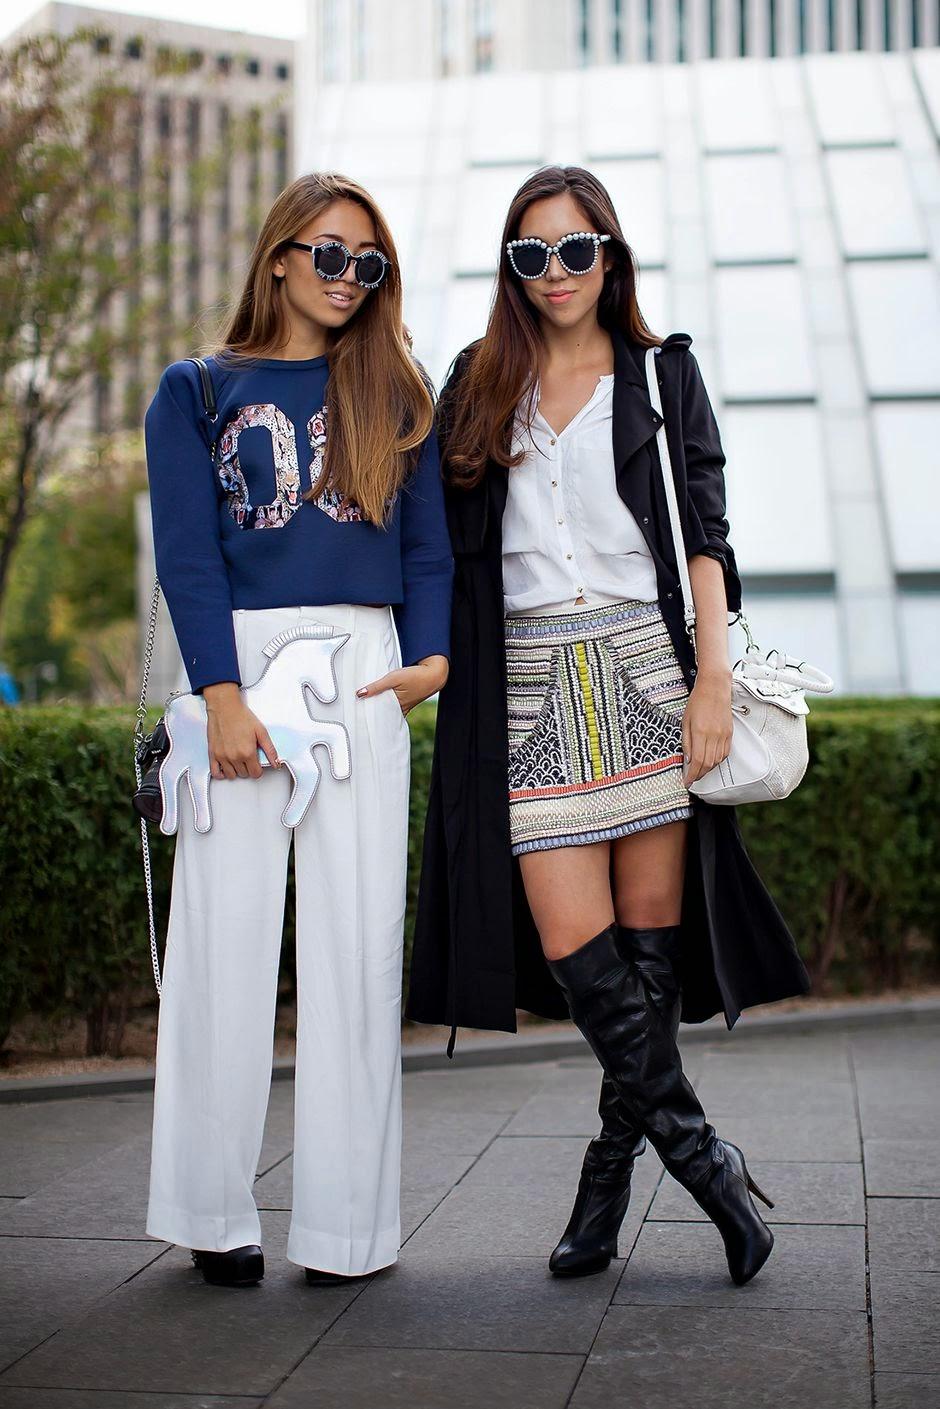 785cd2e3c090 On the street... Jenny   Linda Seoul fashion week 2014 S S ~ echeveau